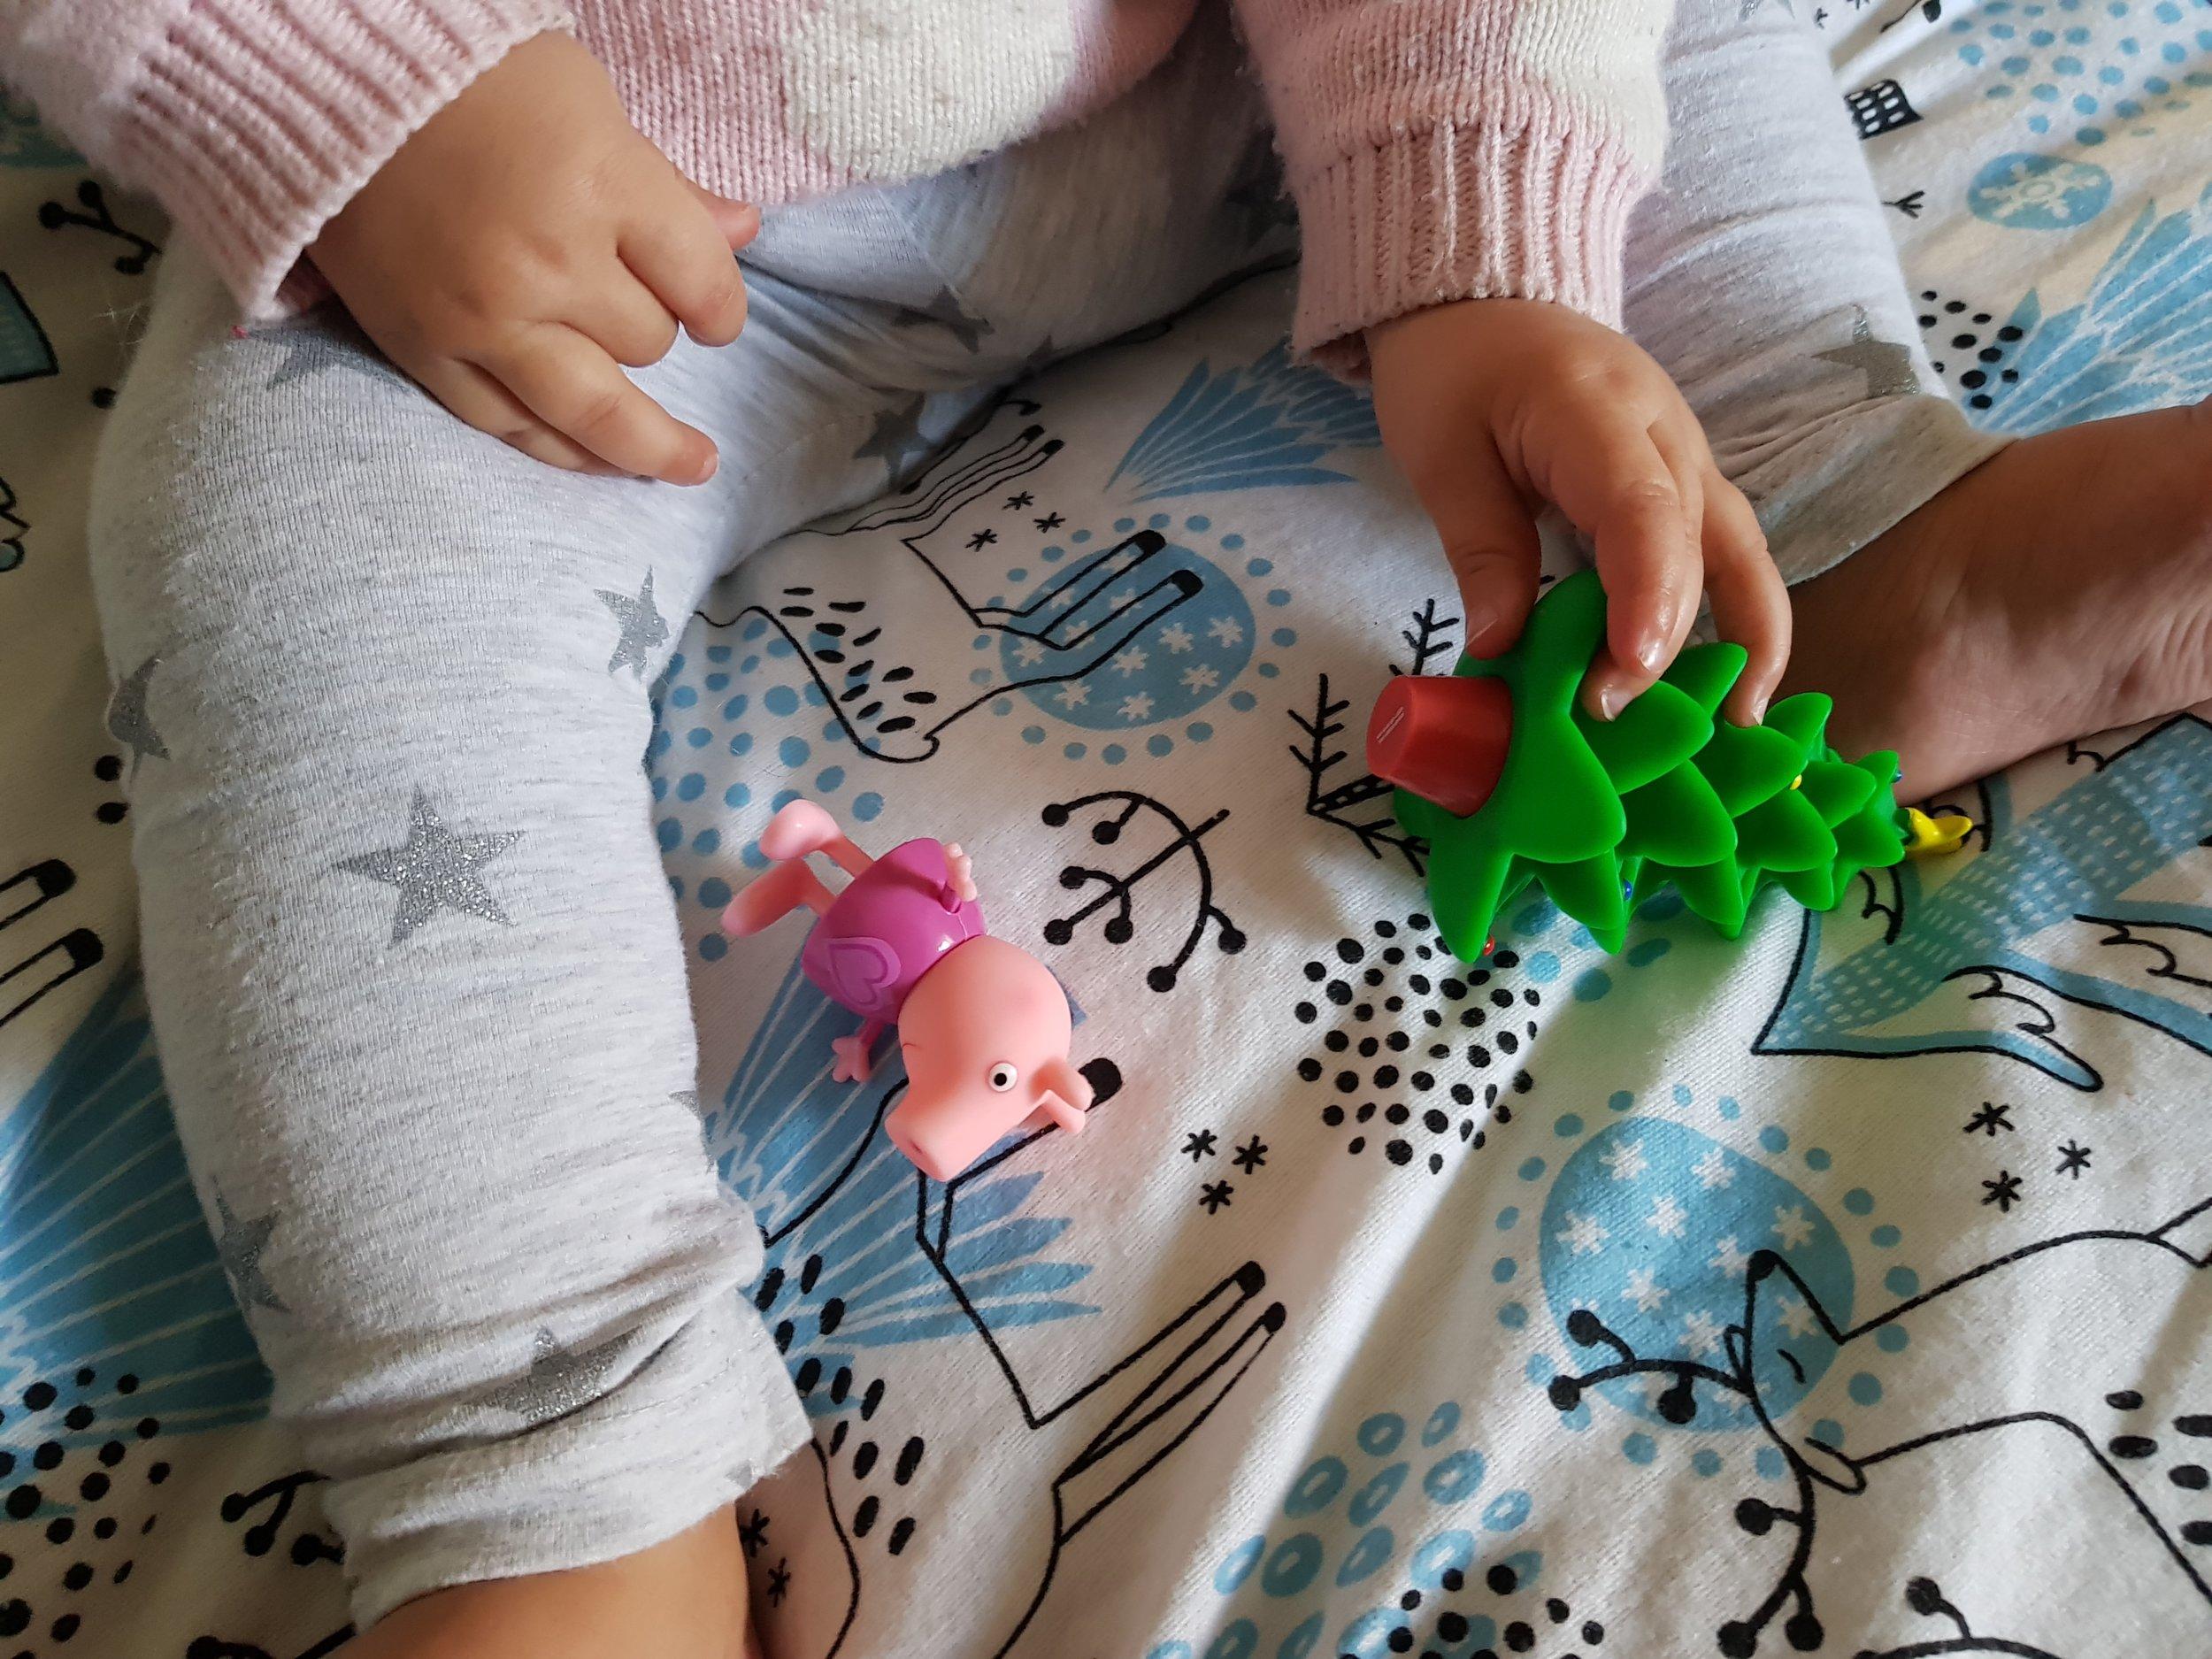 Peppa Pig Presents and Pajamas gift set